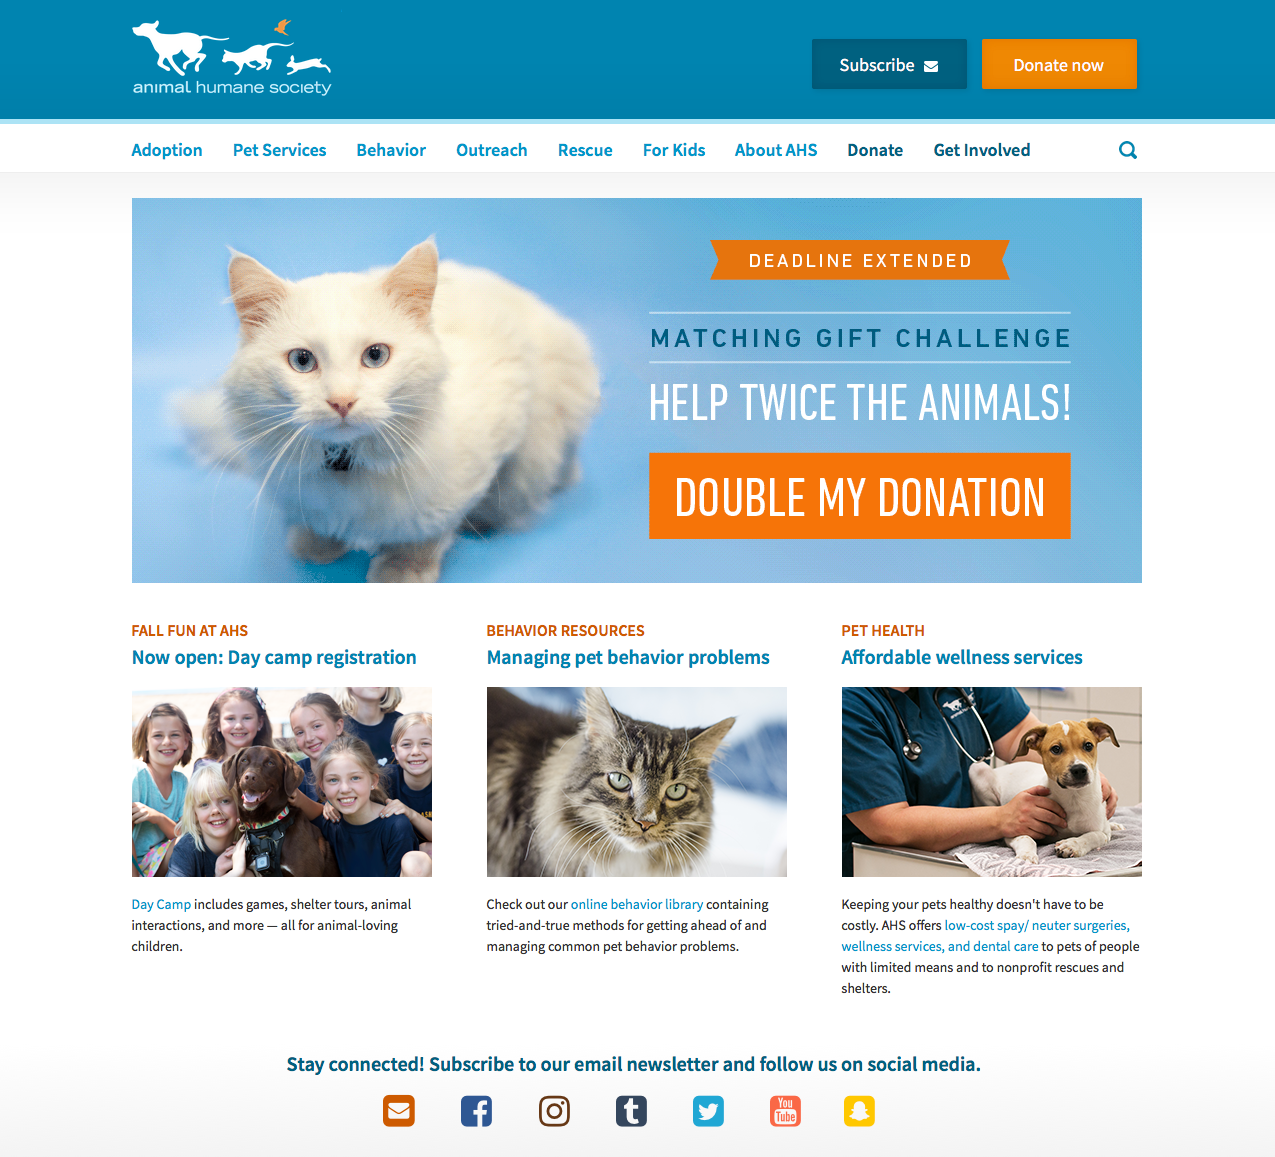 animalhumanesociety.org 2016, Drupal 6